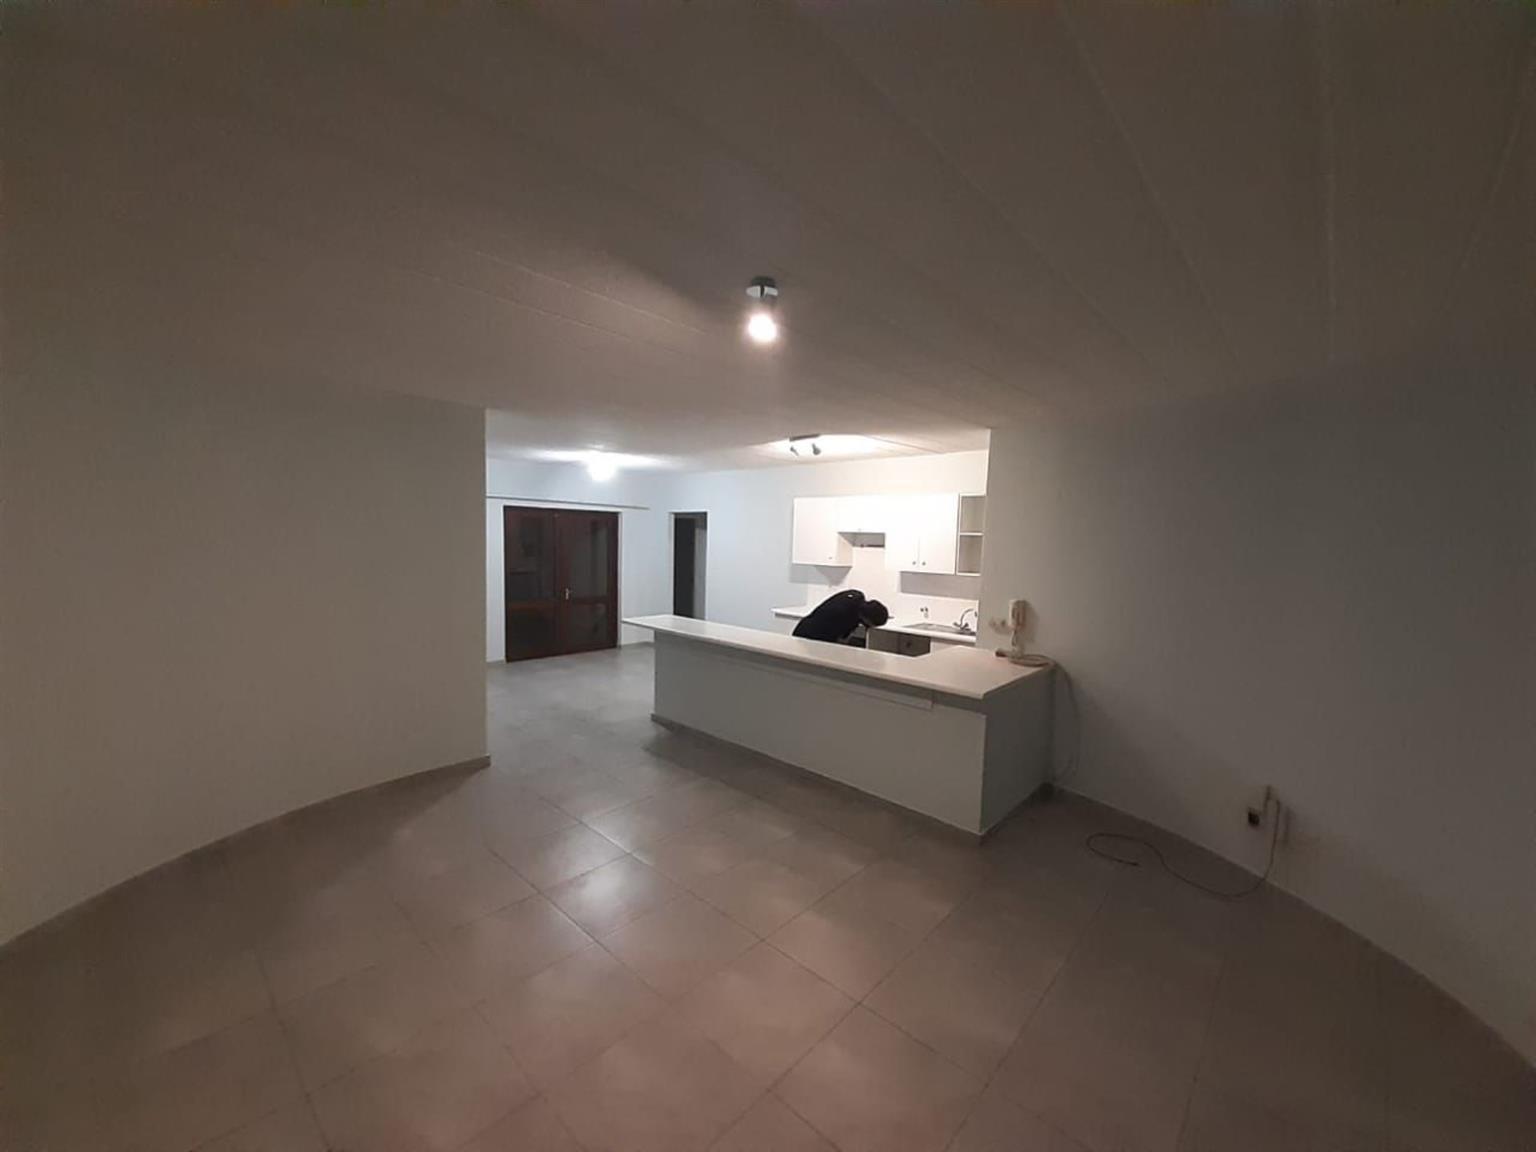 Apartment Rental Monthly in JUKSKEI PARK